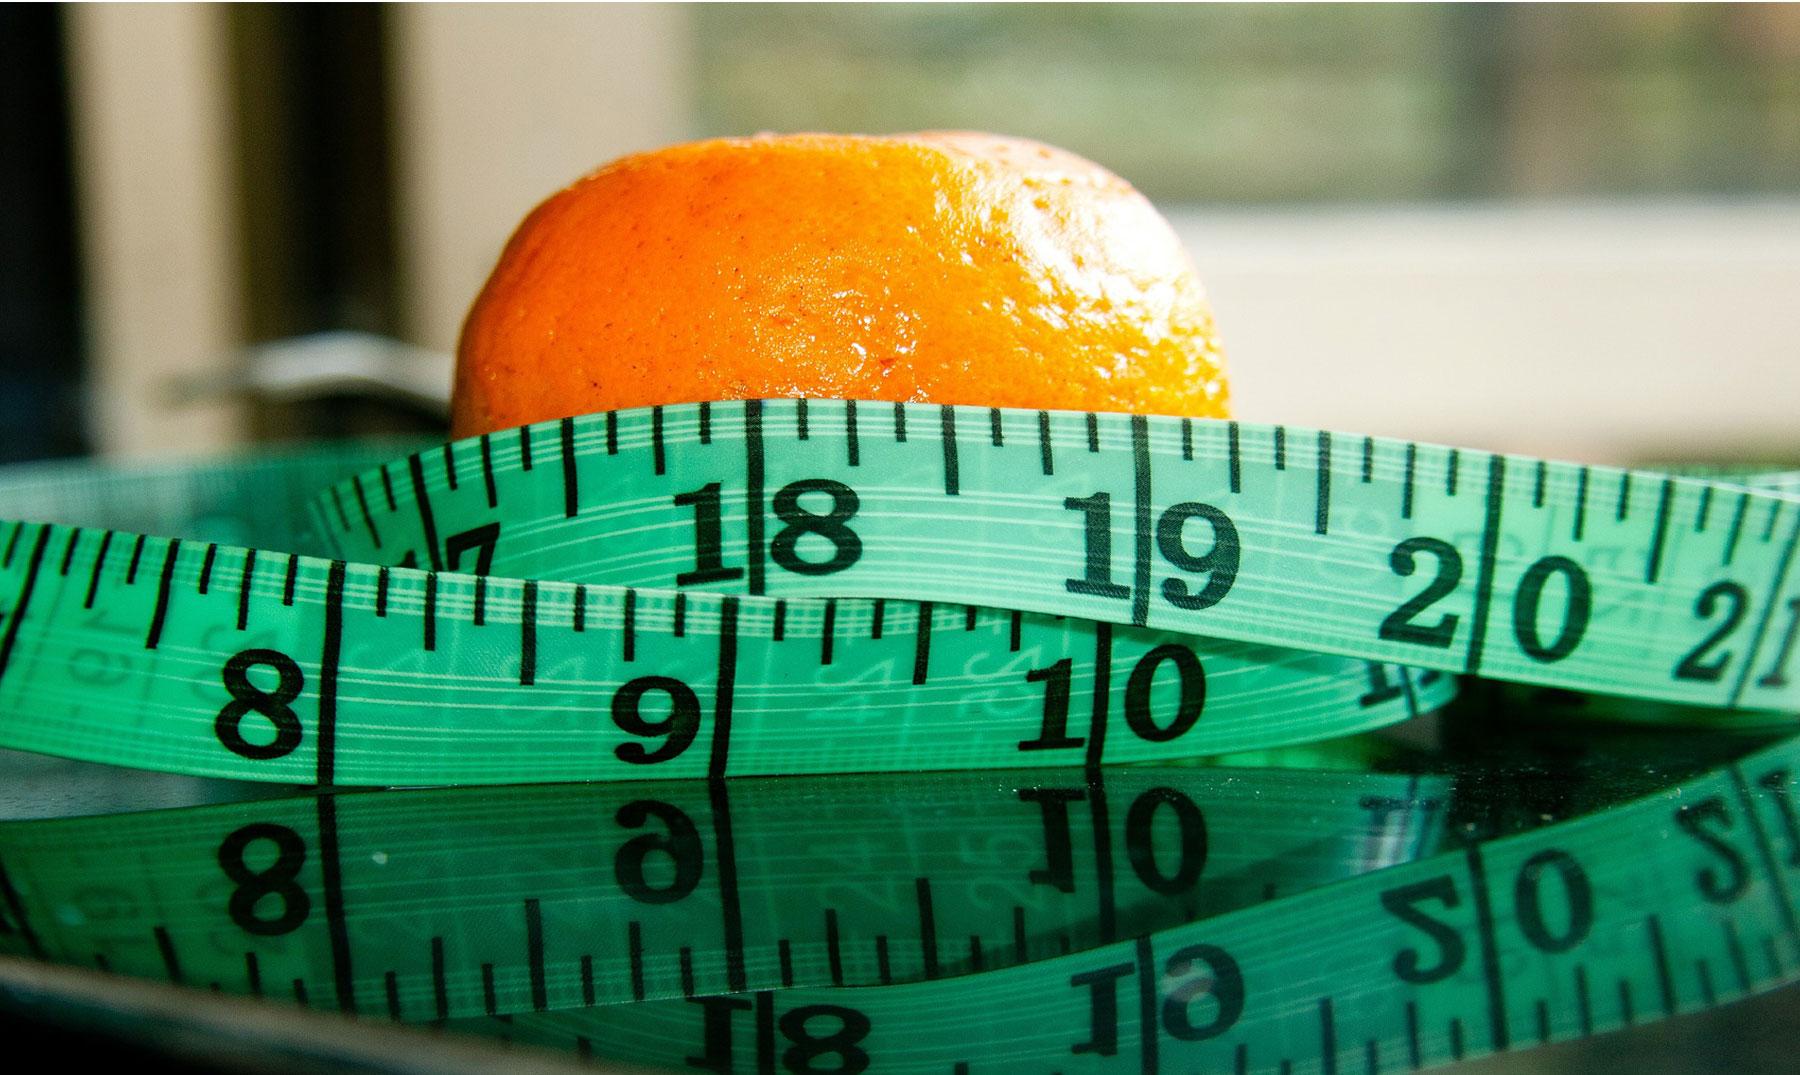 Productos naturales: ¿ayudan a perder peso?